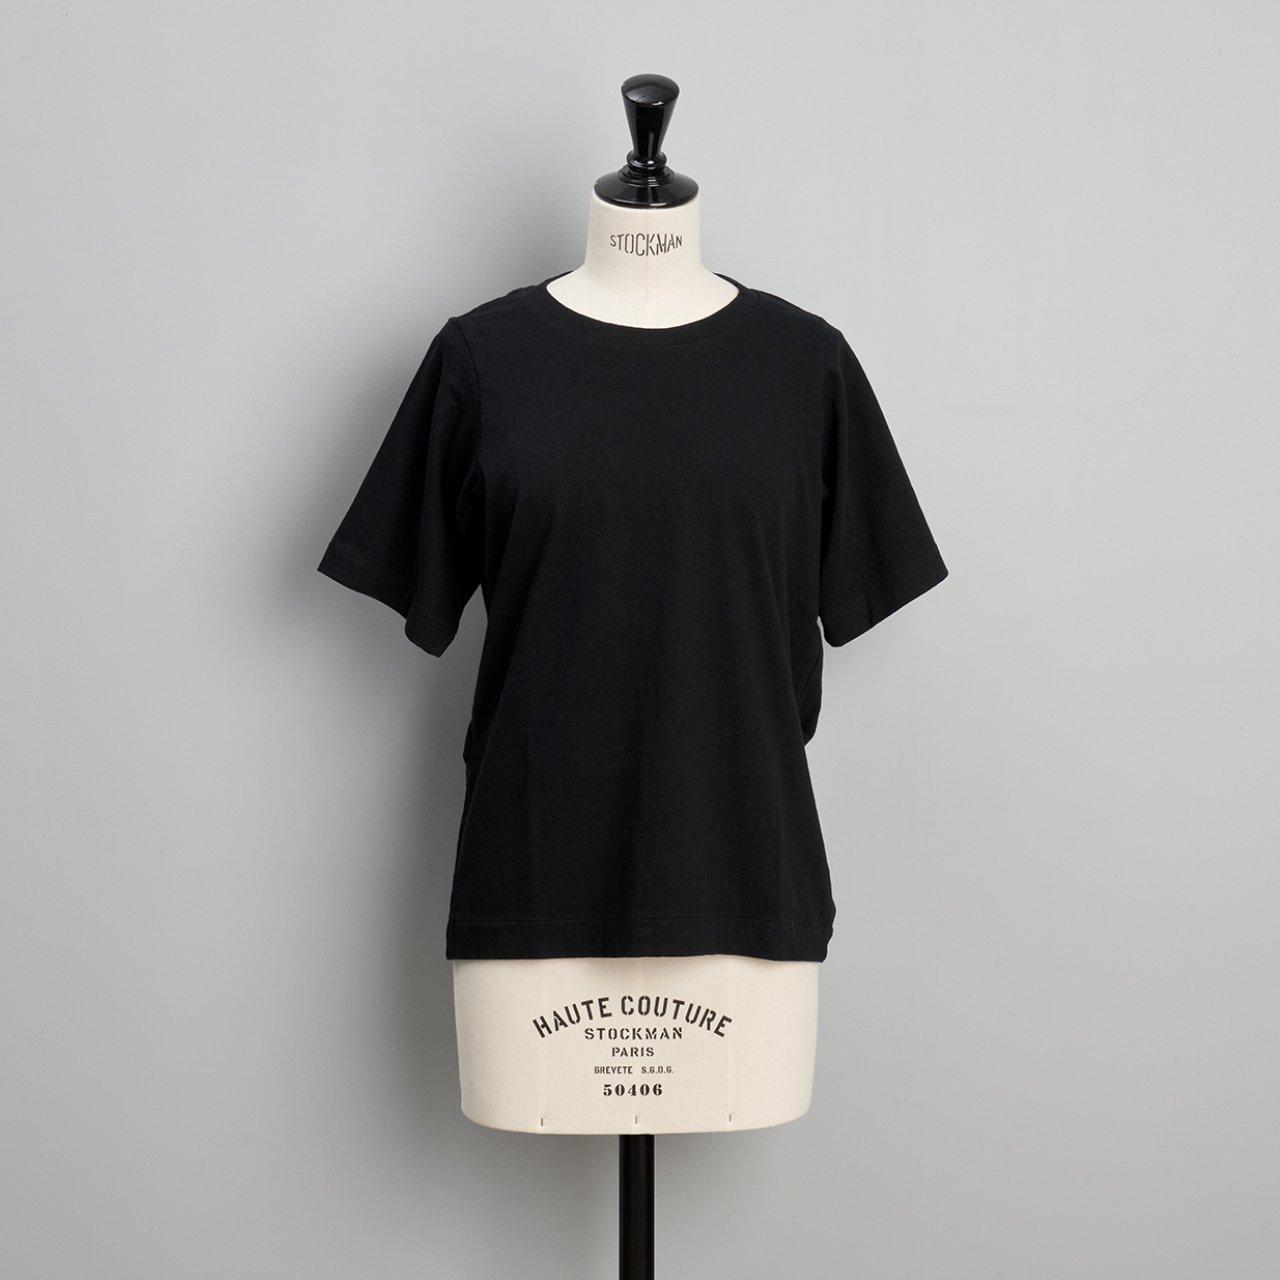 suzuki takayuki<BR>boy's T-shirt<BR>Black